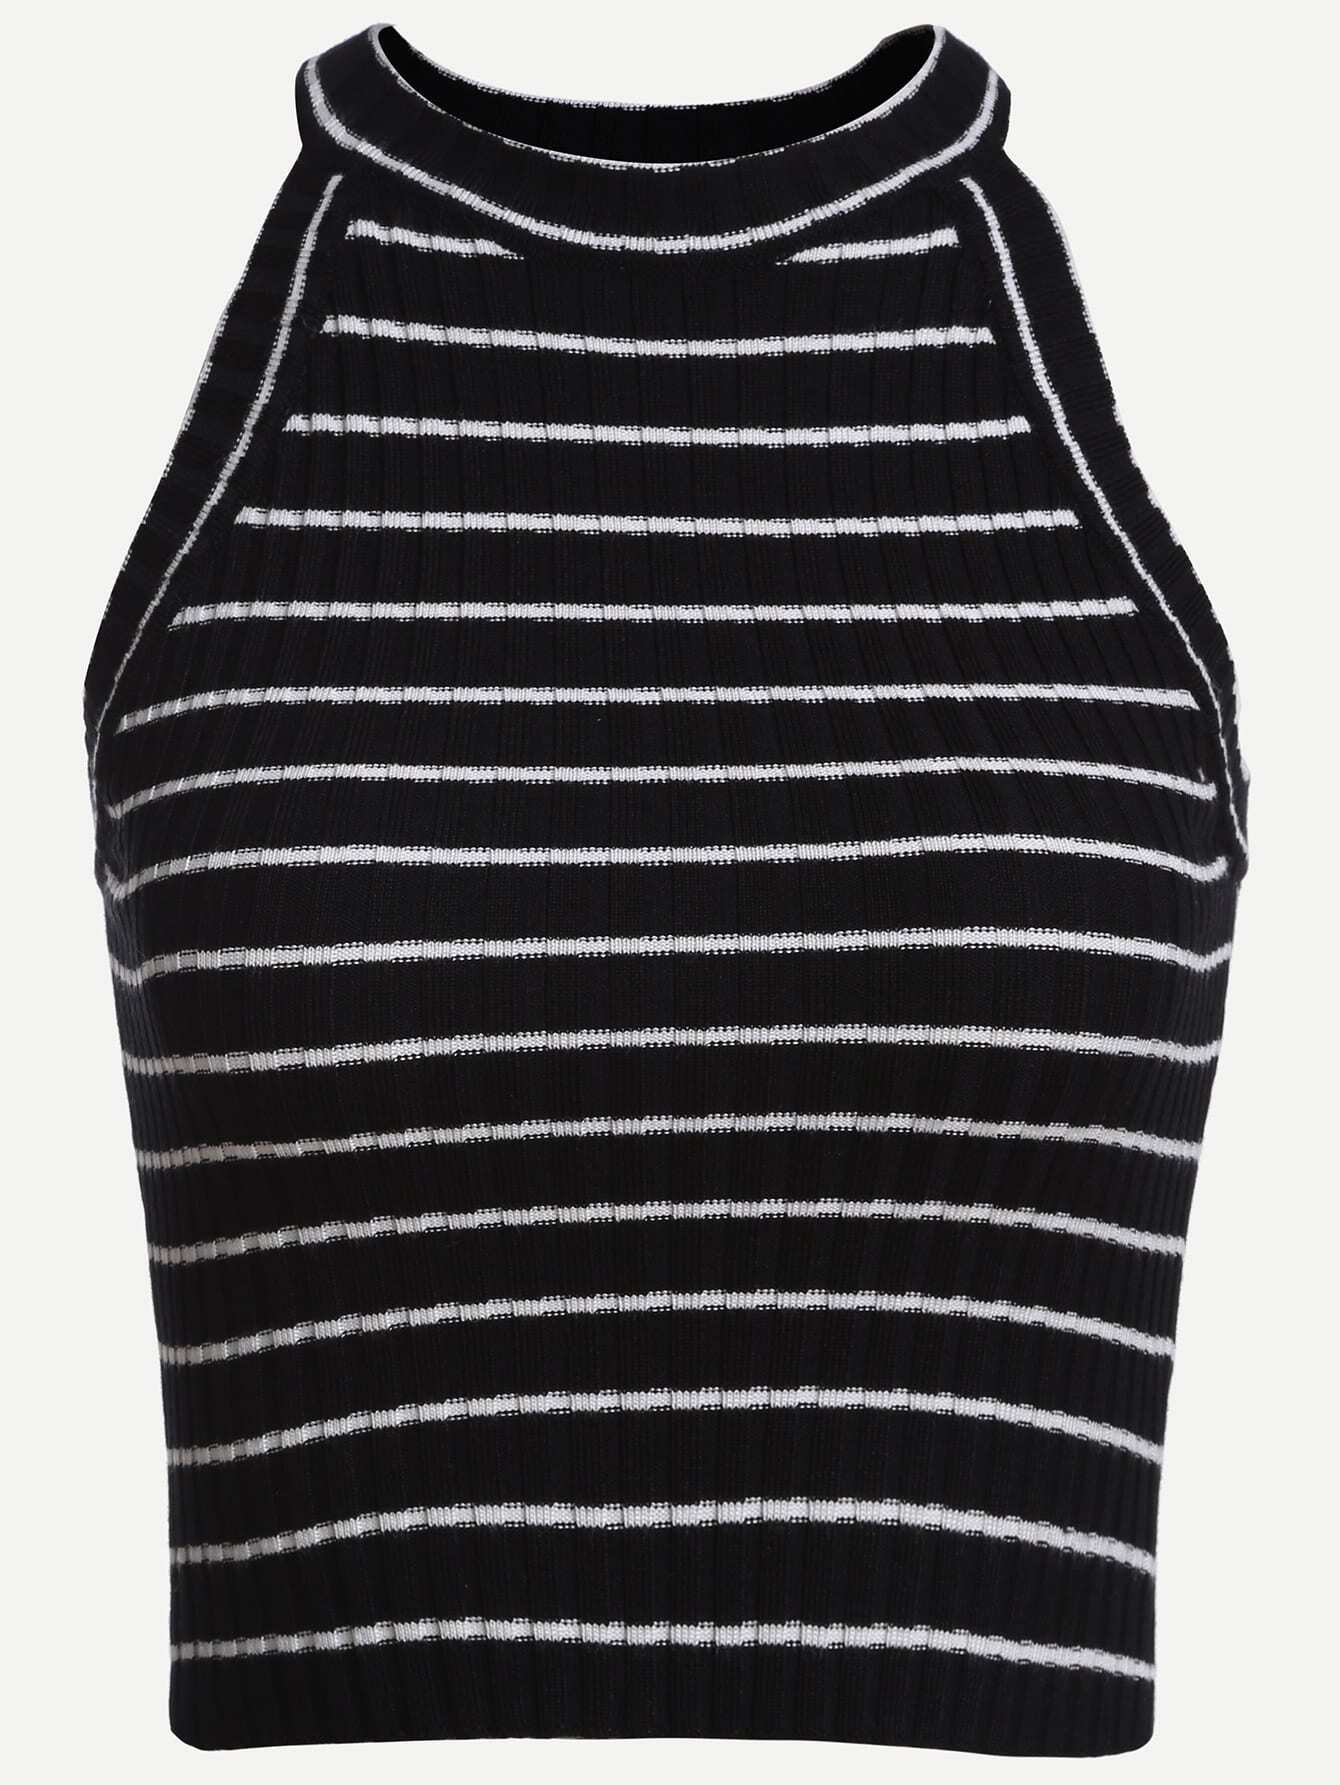 Striped Ribbed Knit Halter Neck Top vest160714021